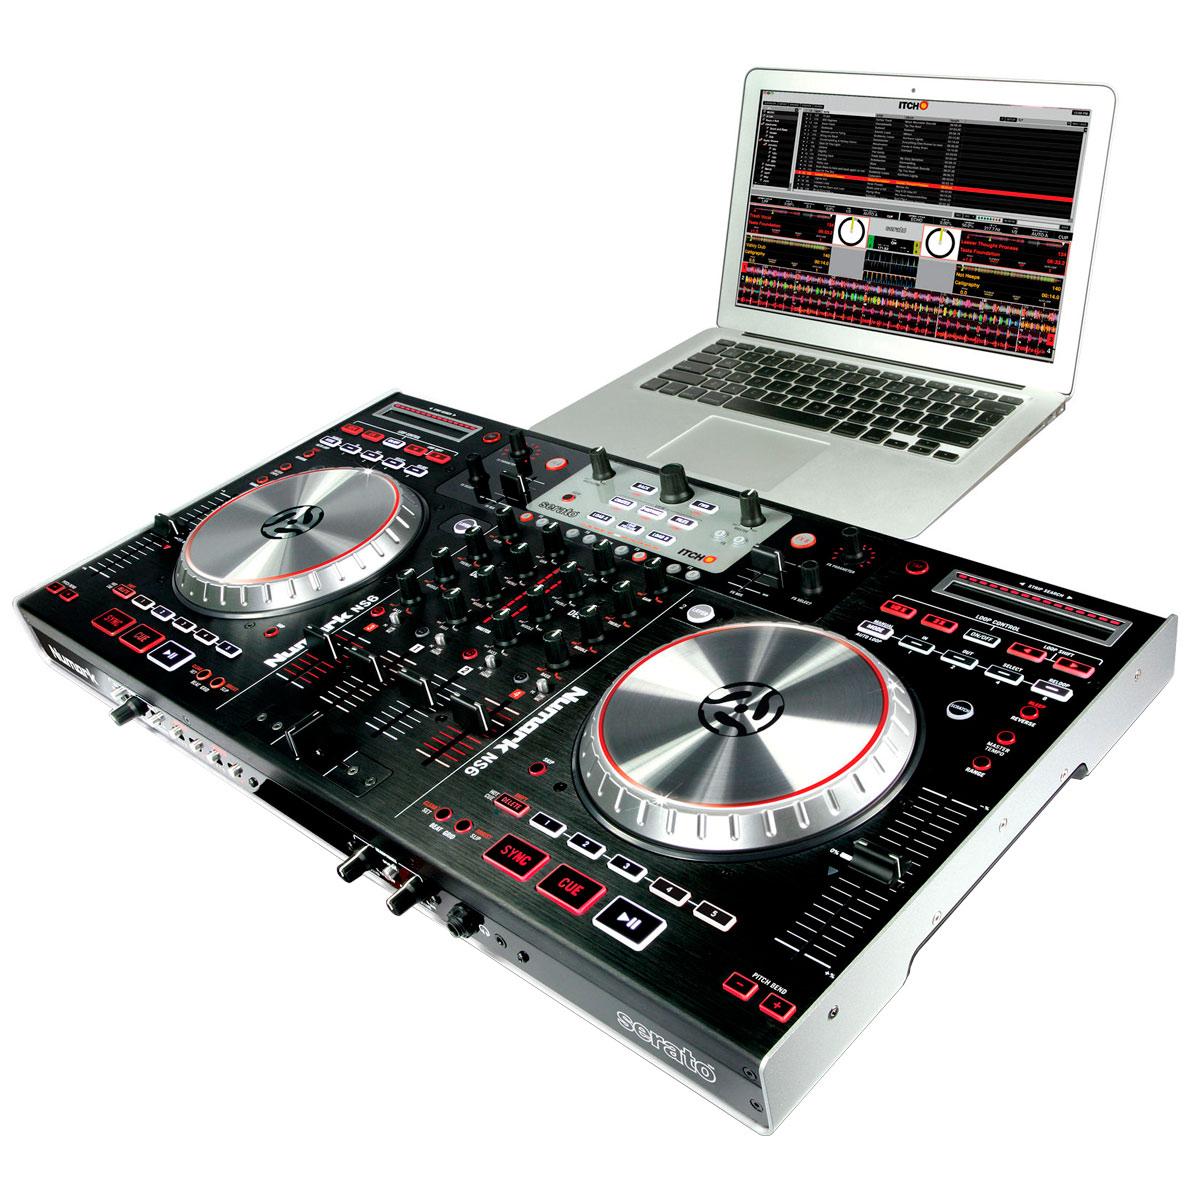 NS6 - Controladora DJ c/ Software Serato Itch NS 6 - Numark